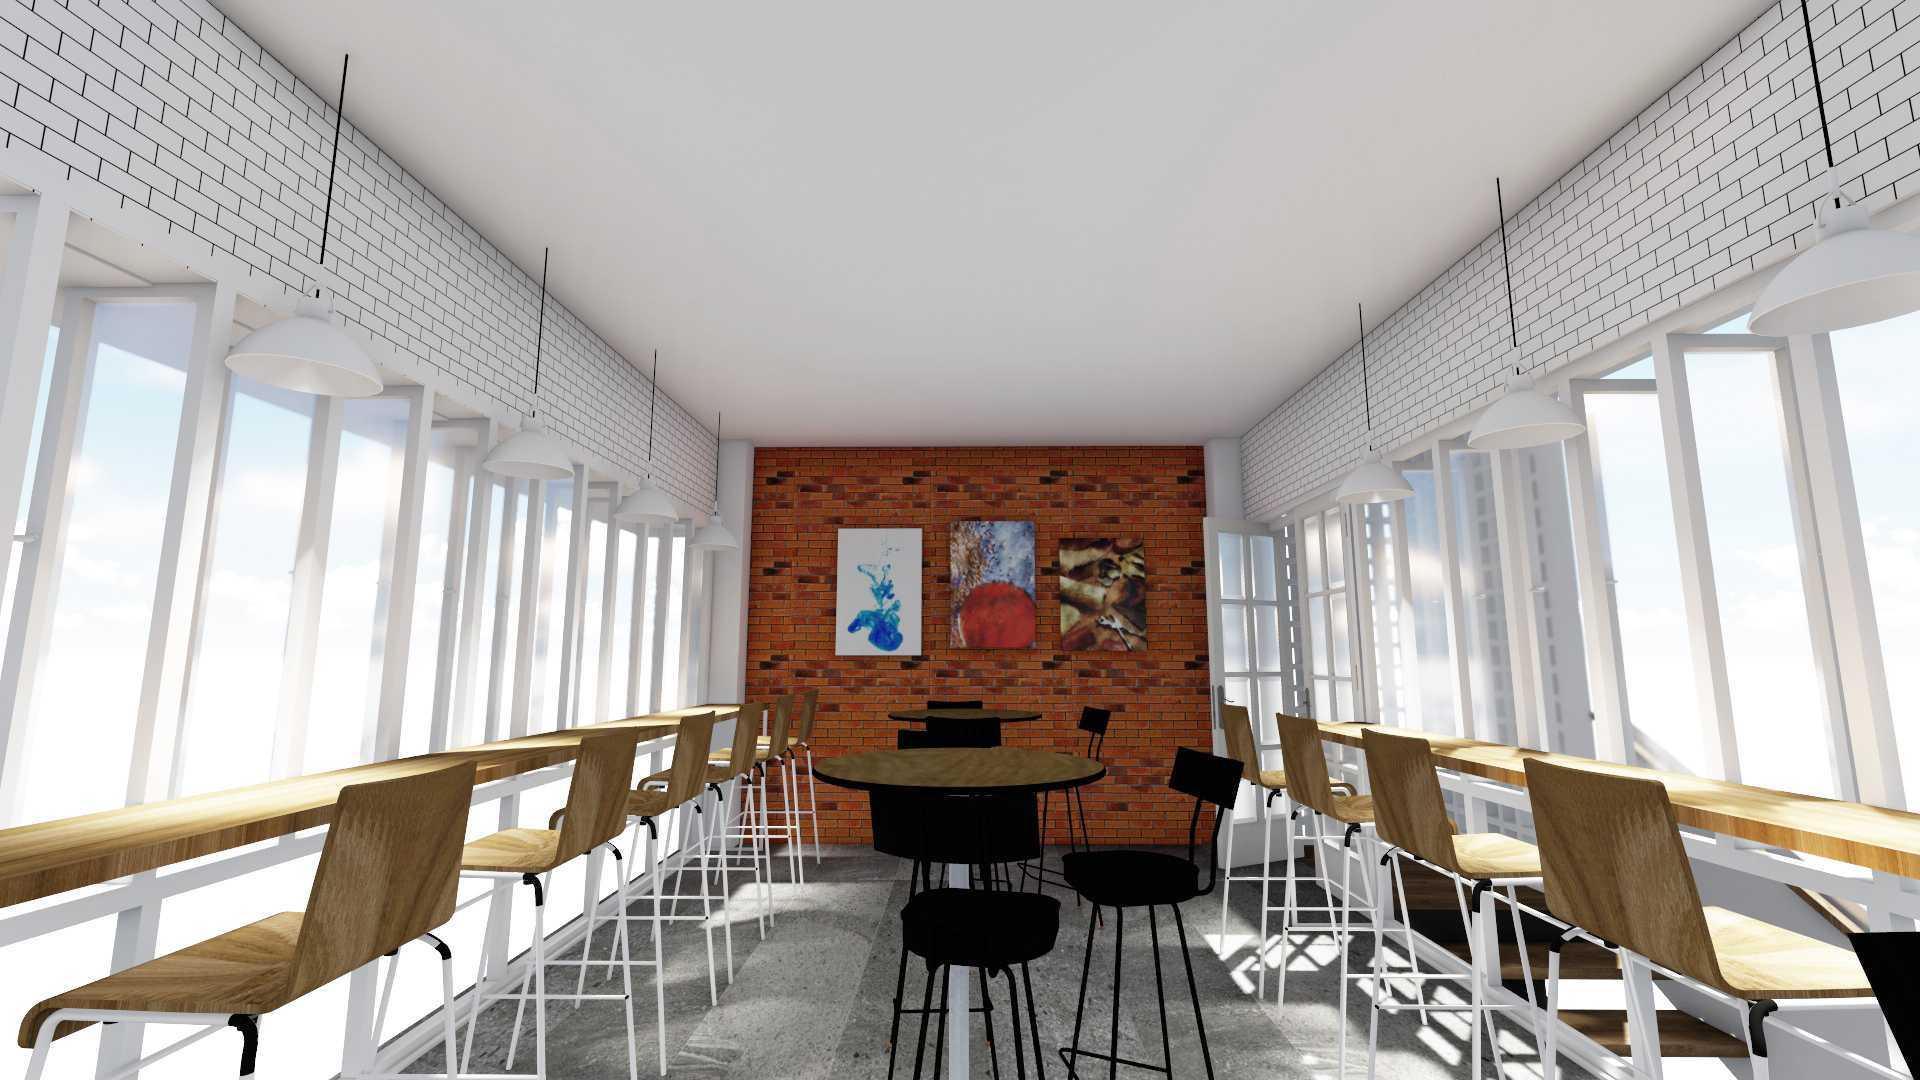 Astabumi Studio Institut Kopi Tegal Tegal, Kota Tegal, Jawa Tengah, Indonesia Tegal, Kota Tegal, Jawa Tengah, Indonesia Astabumi-Architect-Interior-Design-Institut-Kopi-Tegal  83521